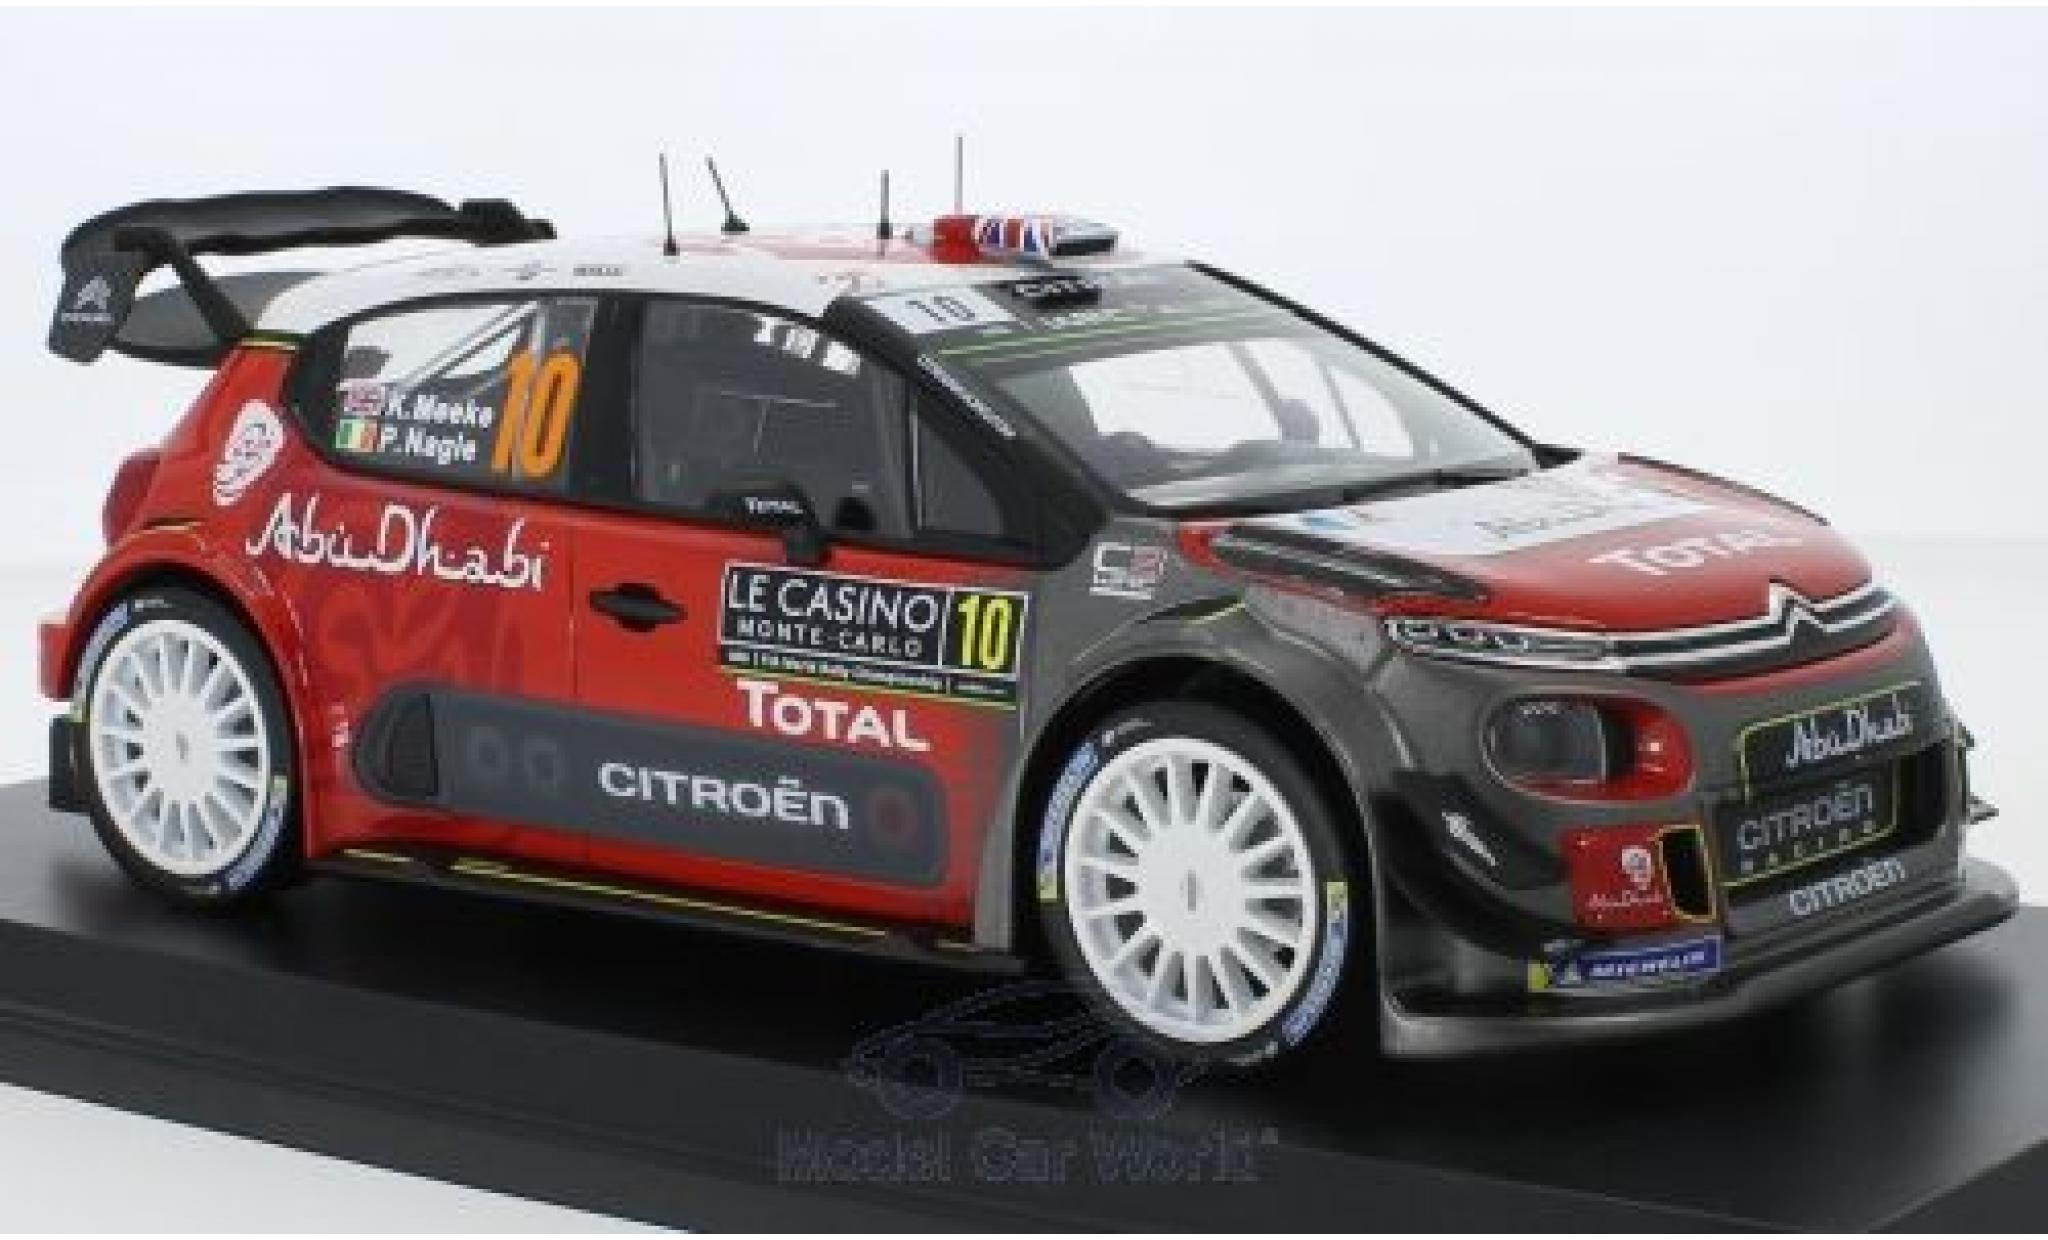 Citroen C3 1/18 Norev WRC No.10 Rallye WM Rallye Monte Carlo 2018 K.Meeke/P.Nagle